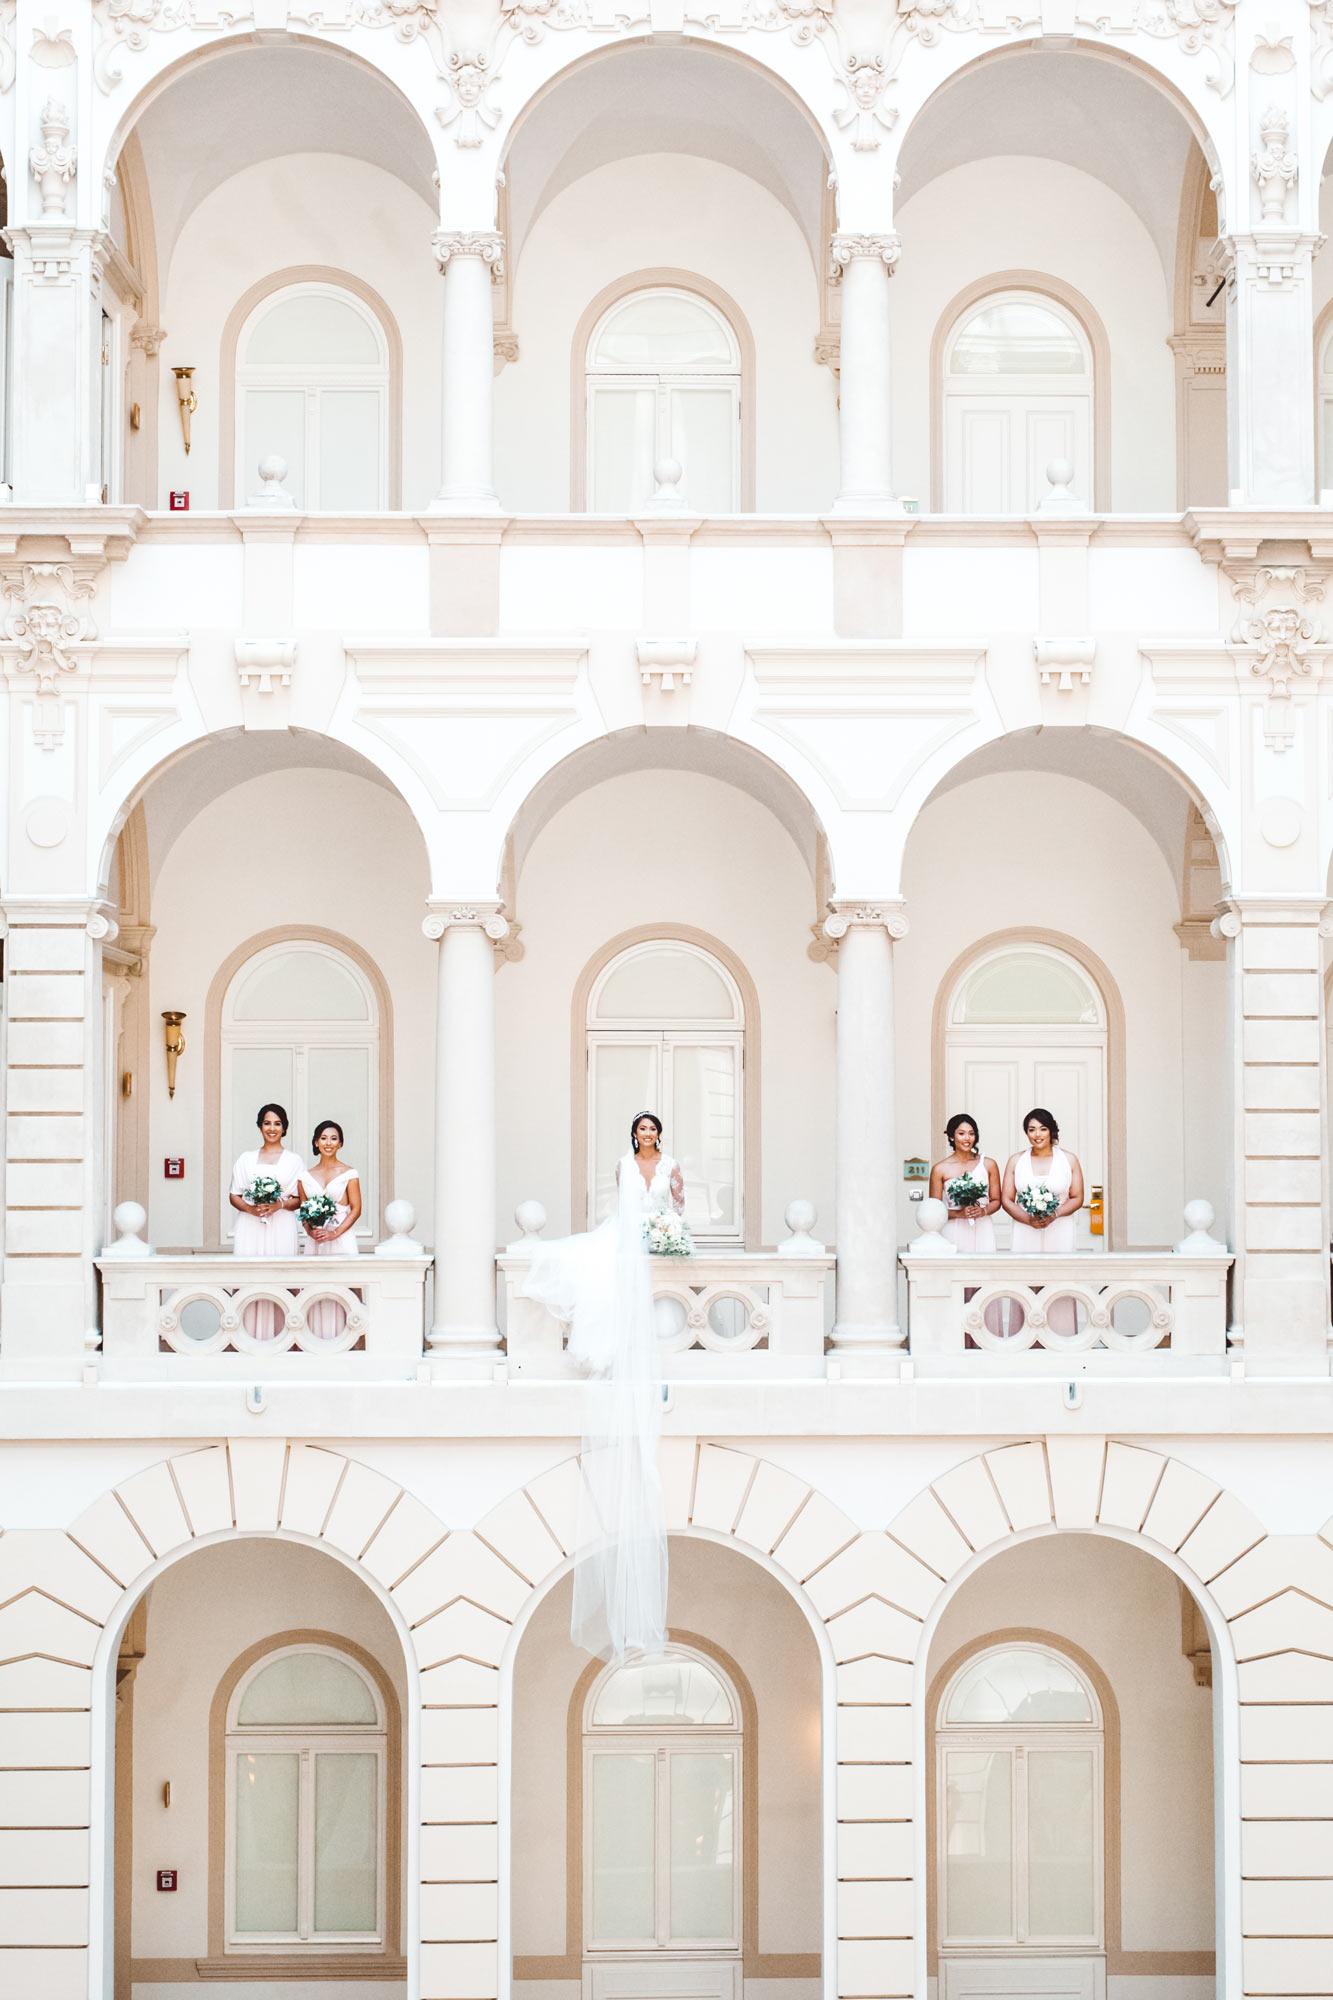 BeckyLee-wedding11.jpg